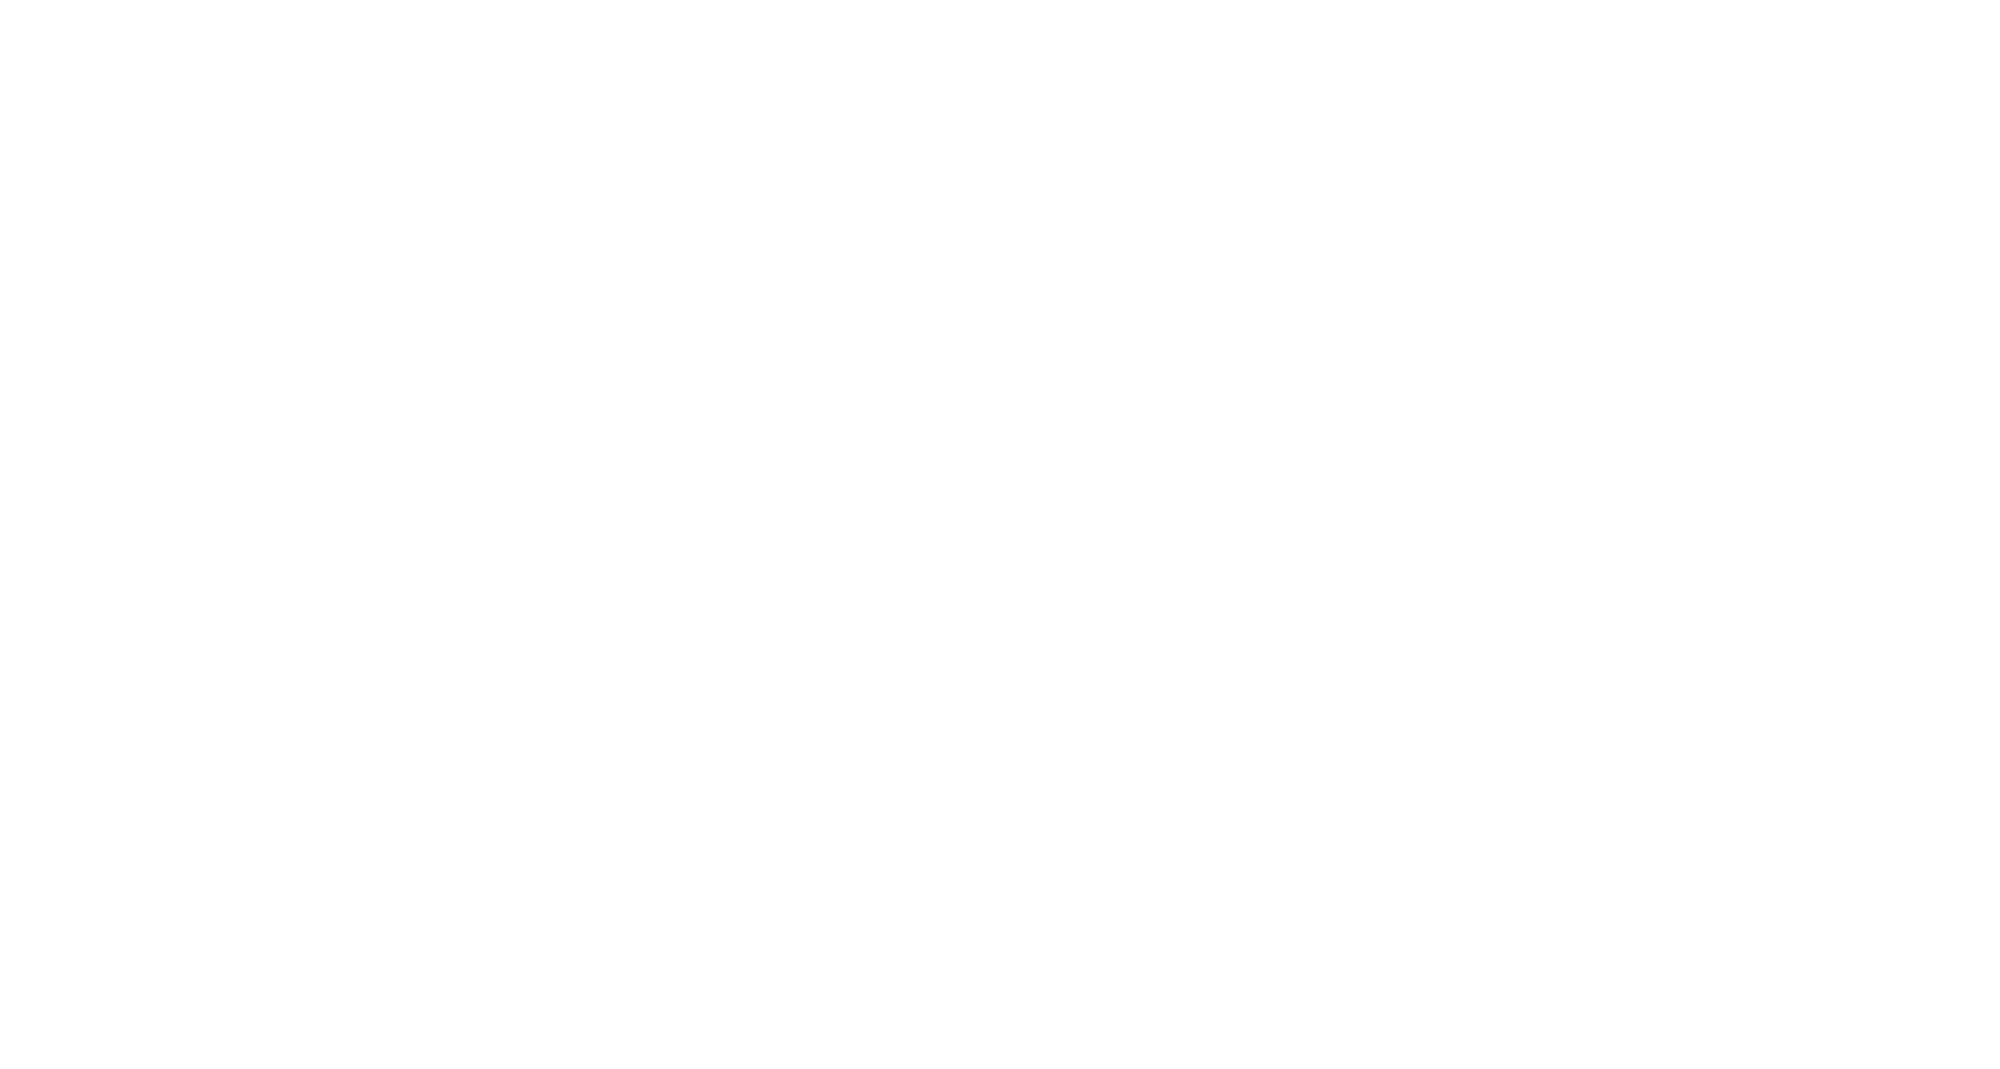 dvelop-logo-invers-Jul-26-2021-07-55-01-27-AM